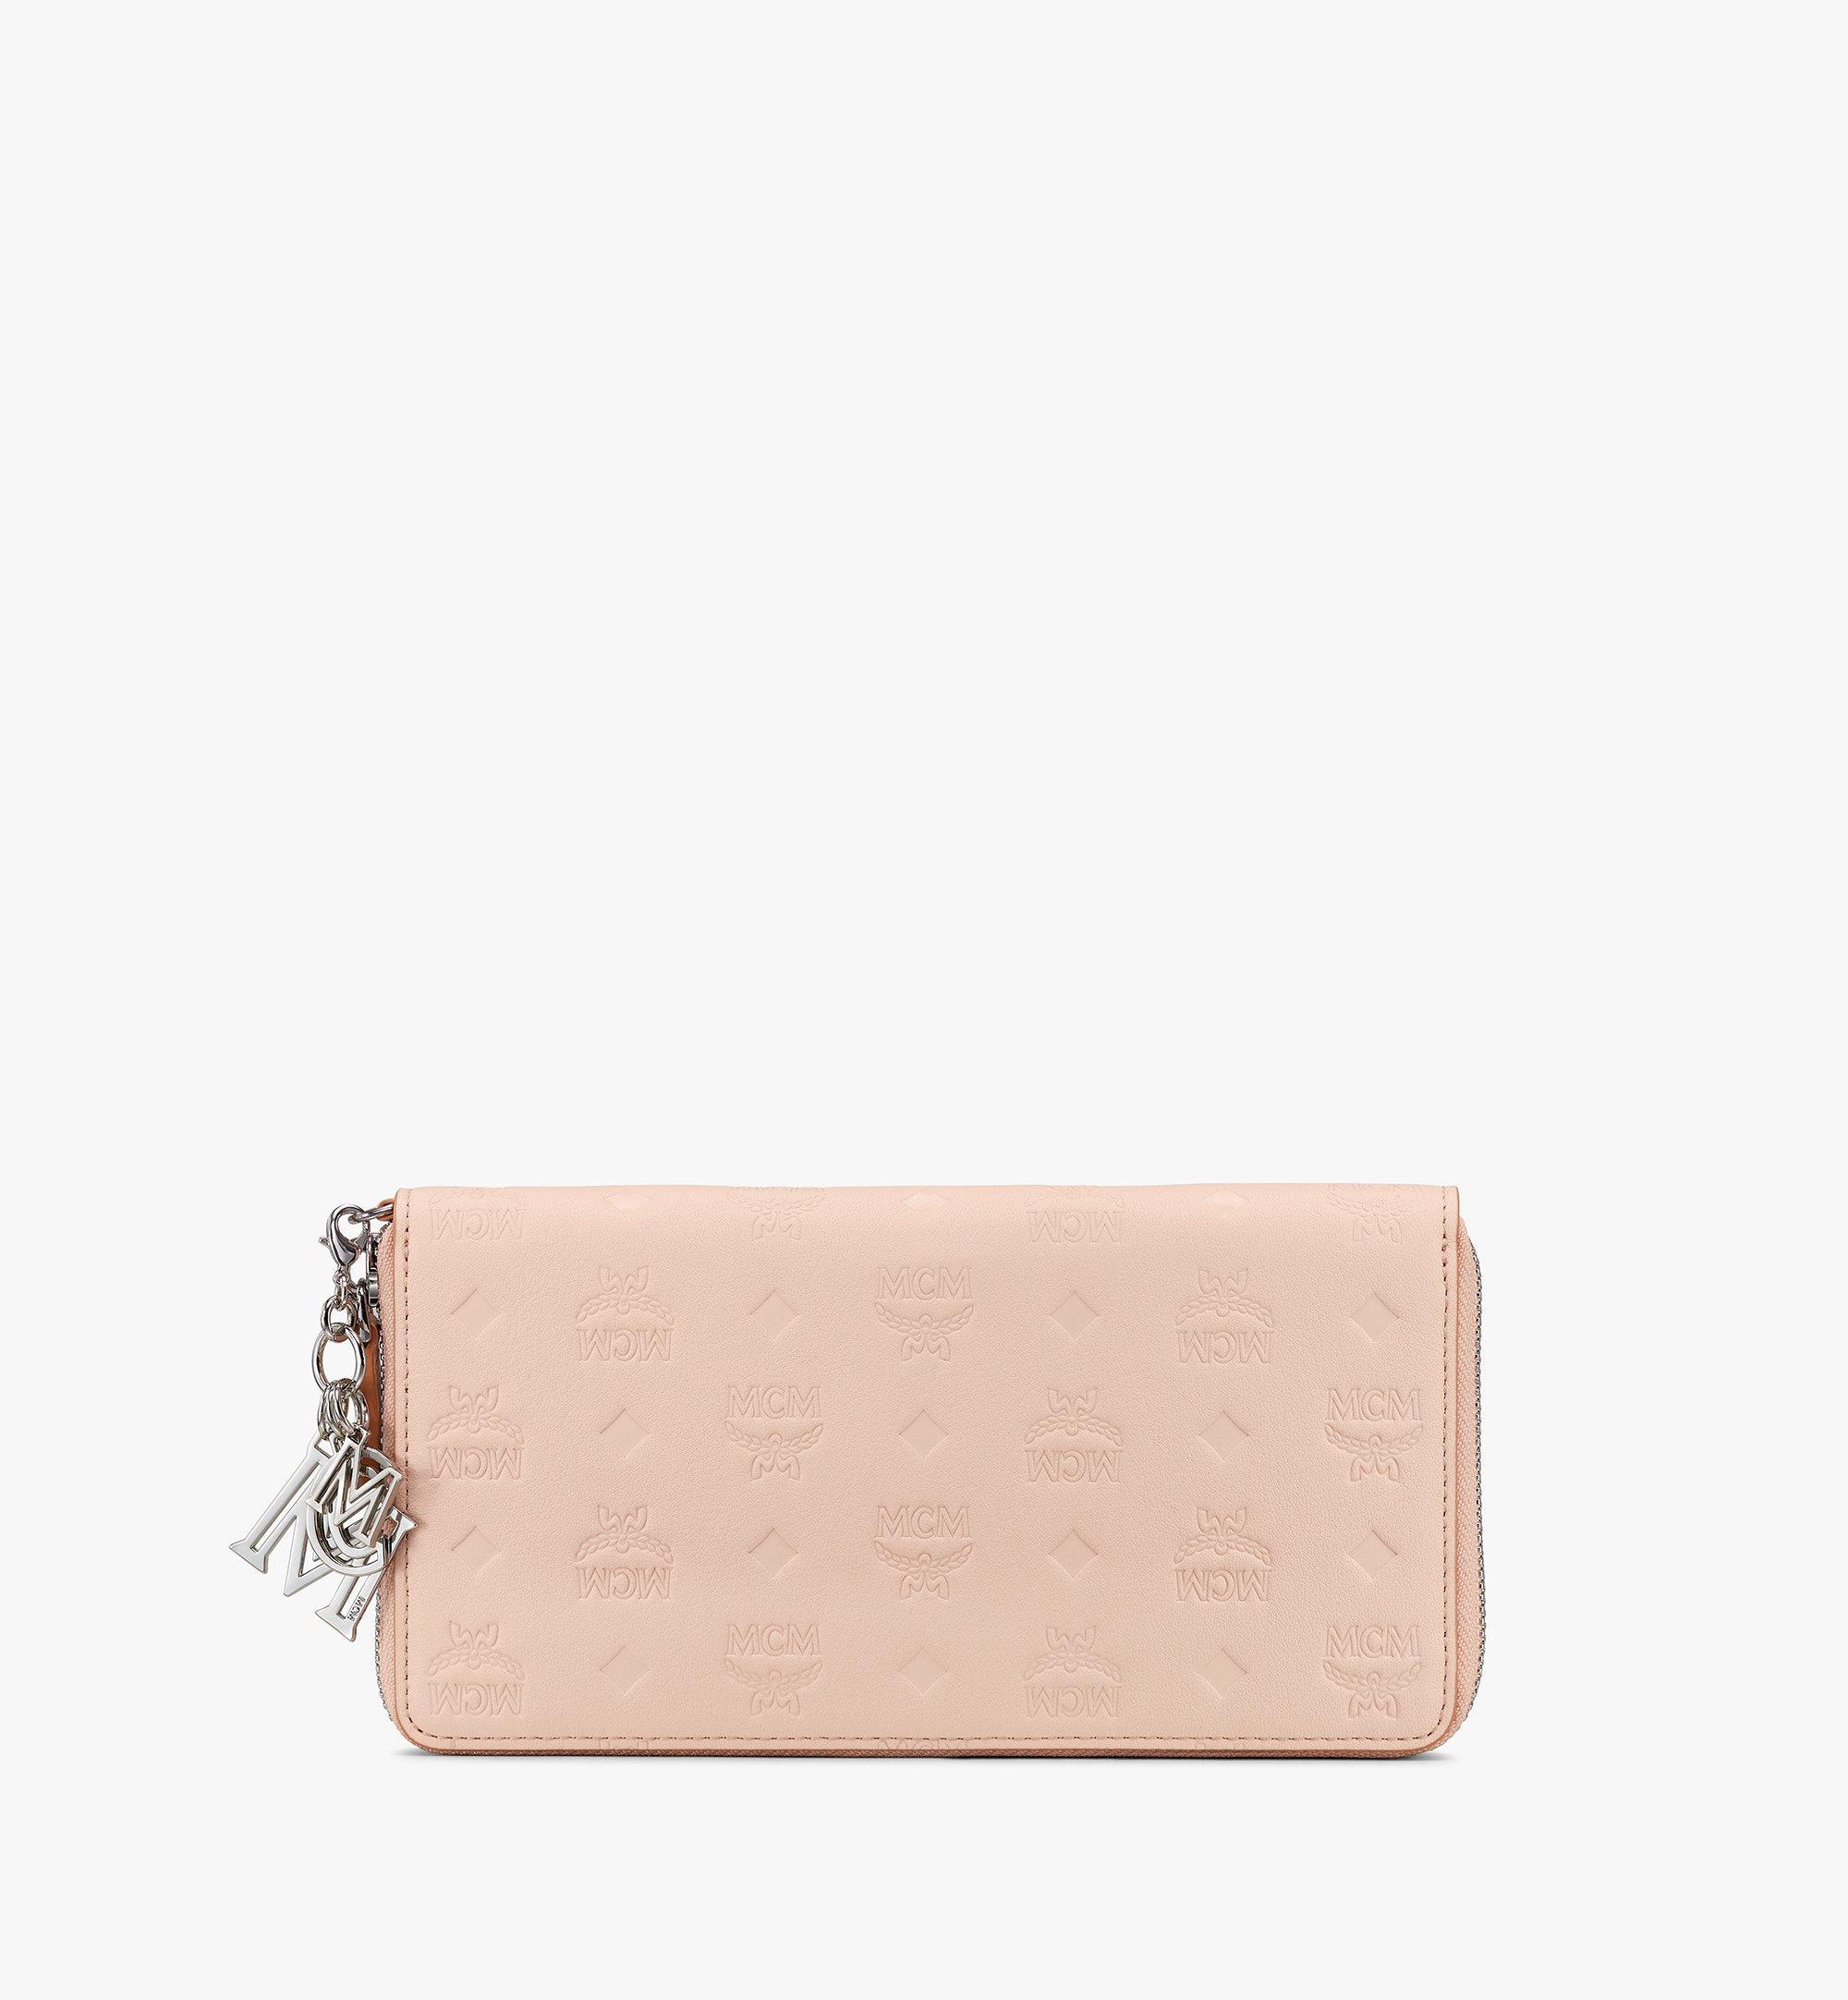 MCM Klara Zip Wallet in Monogram Leather Beige MYL9SKM11II001 Alternate View 1